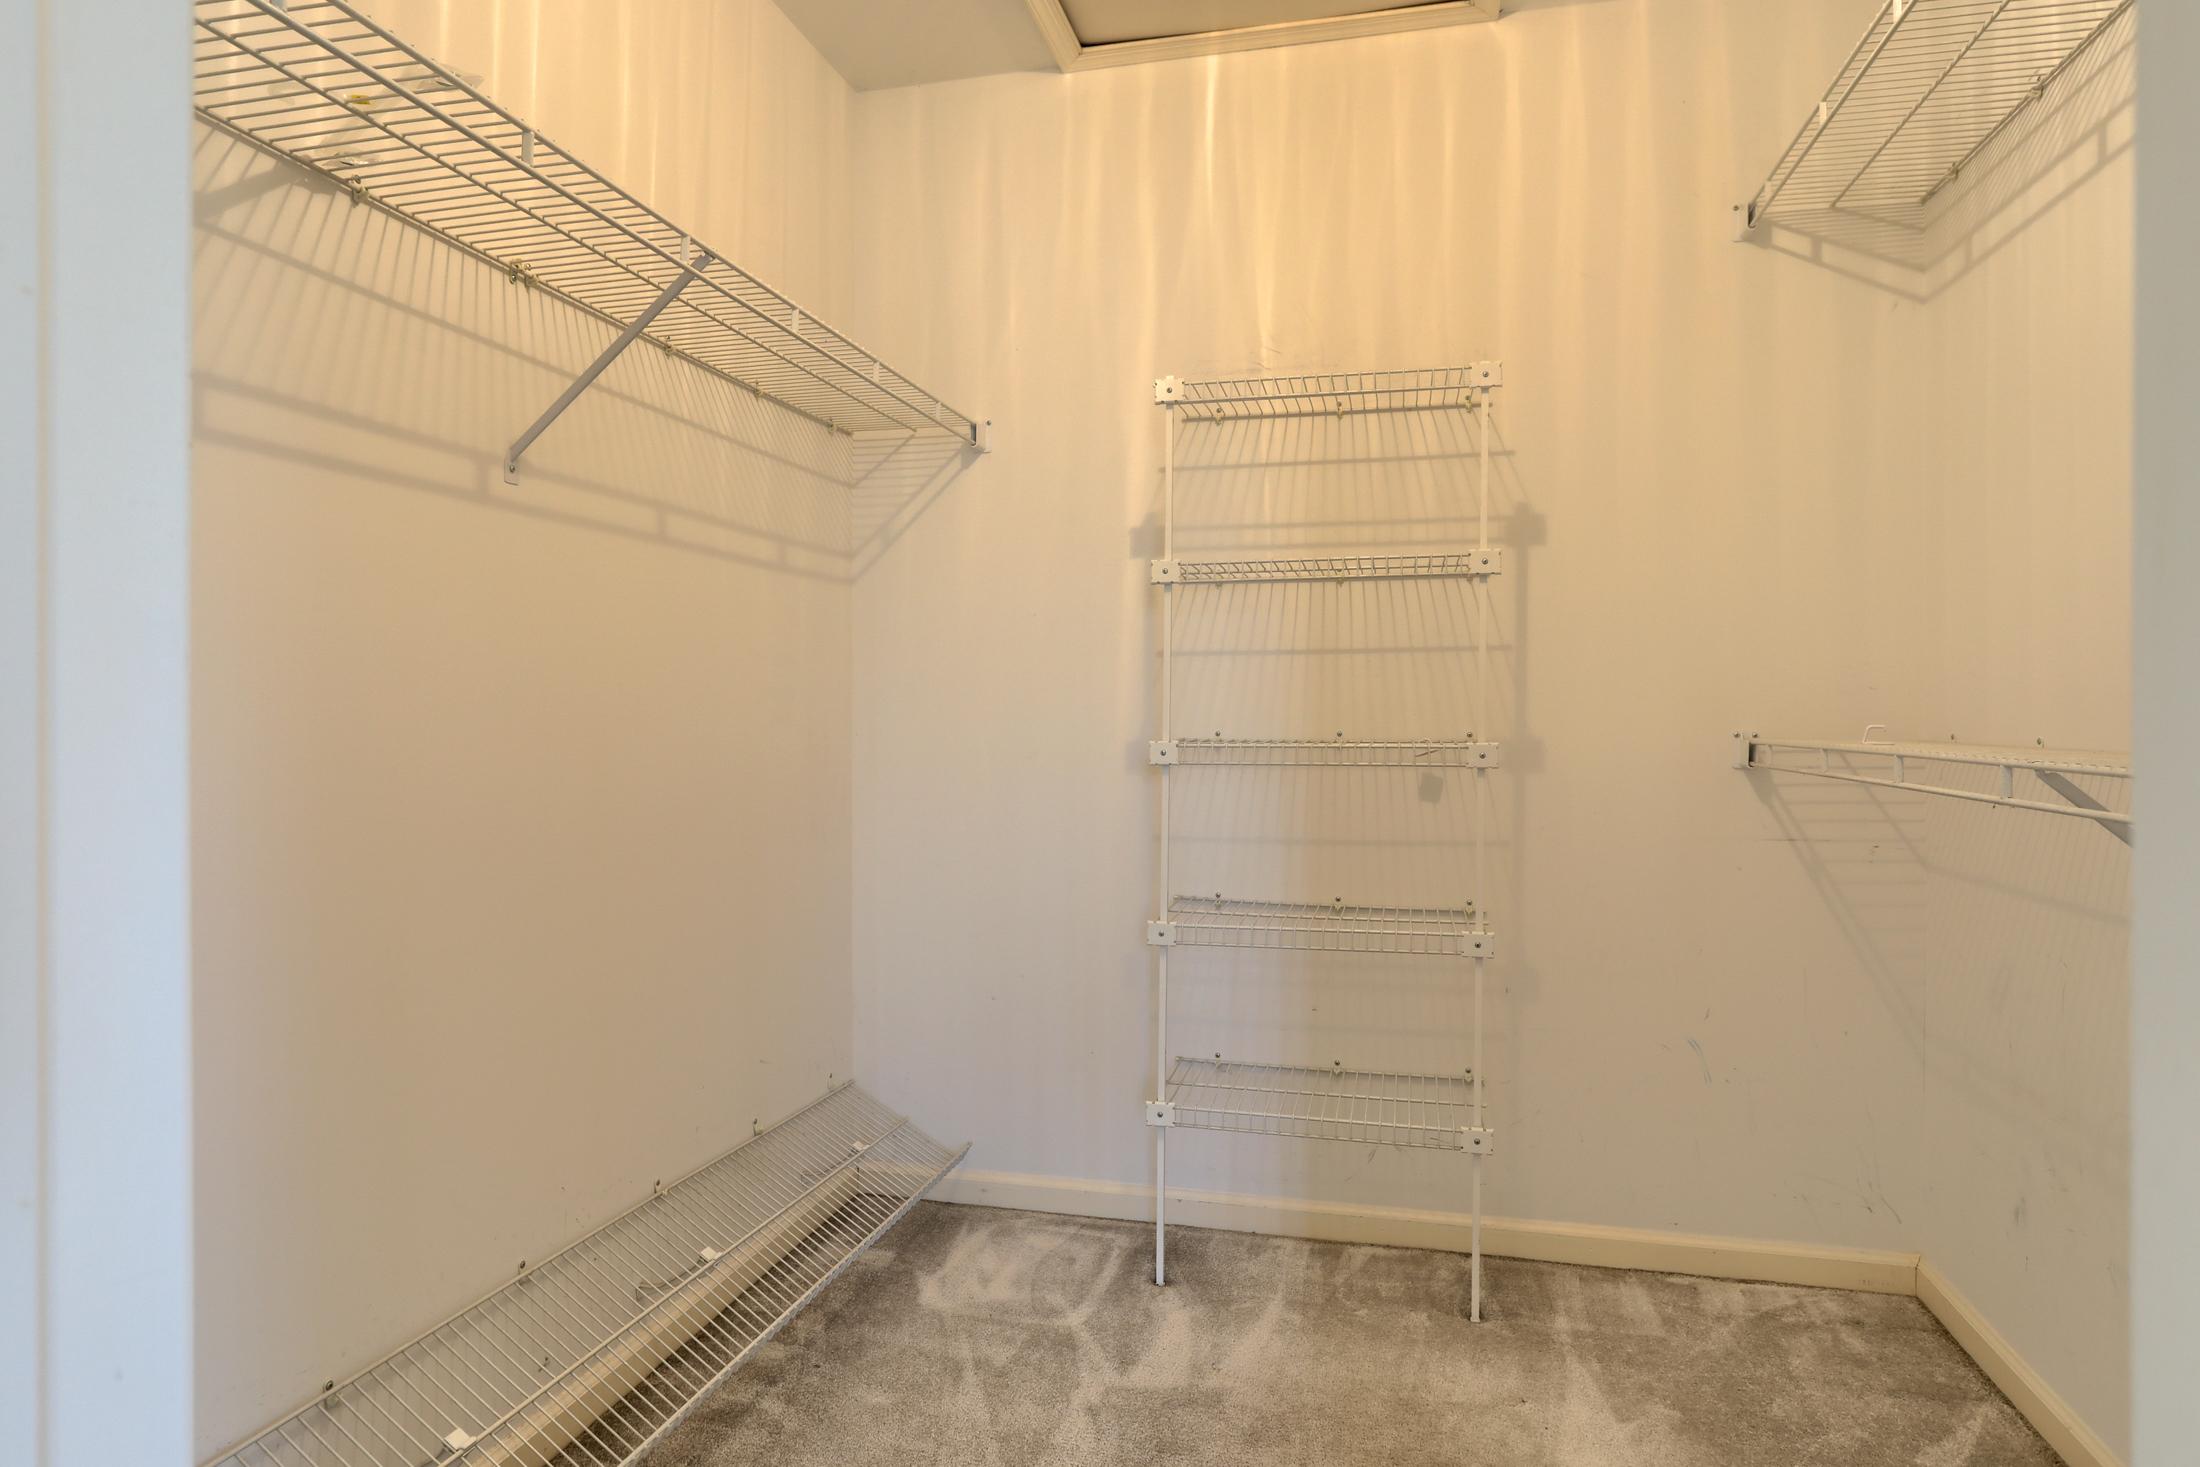 26 W. Strack Drive - Main bedroom closet